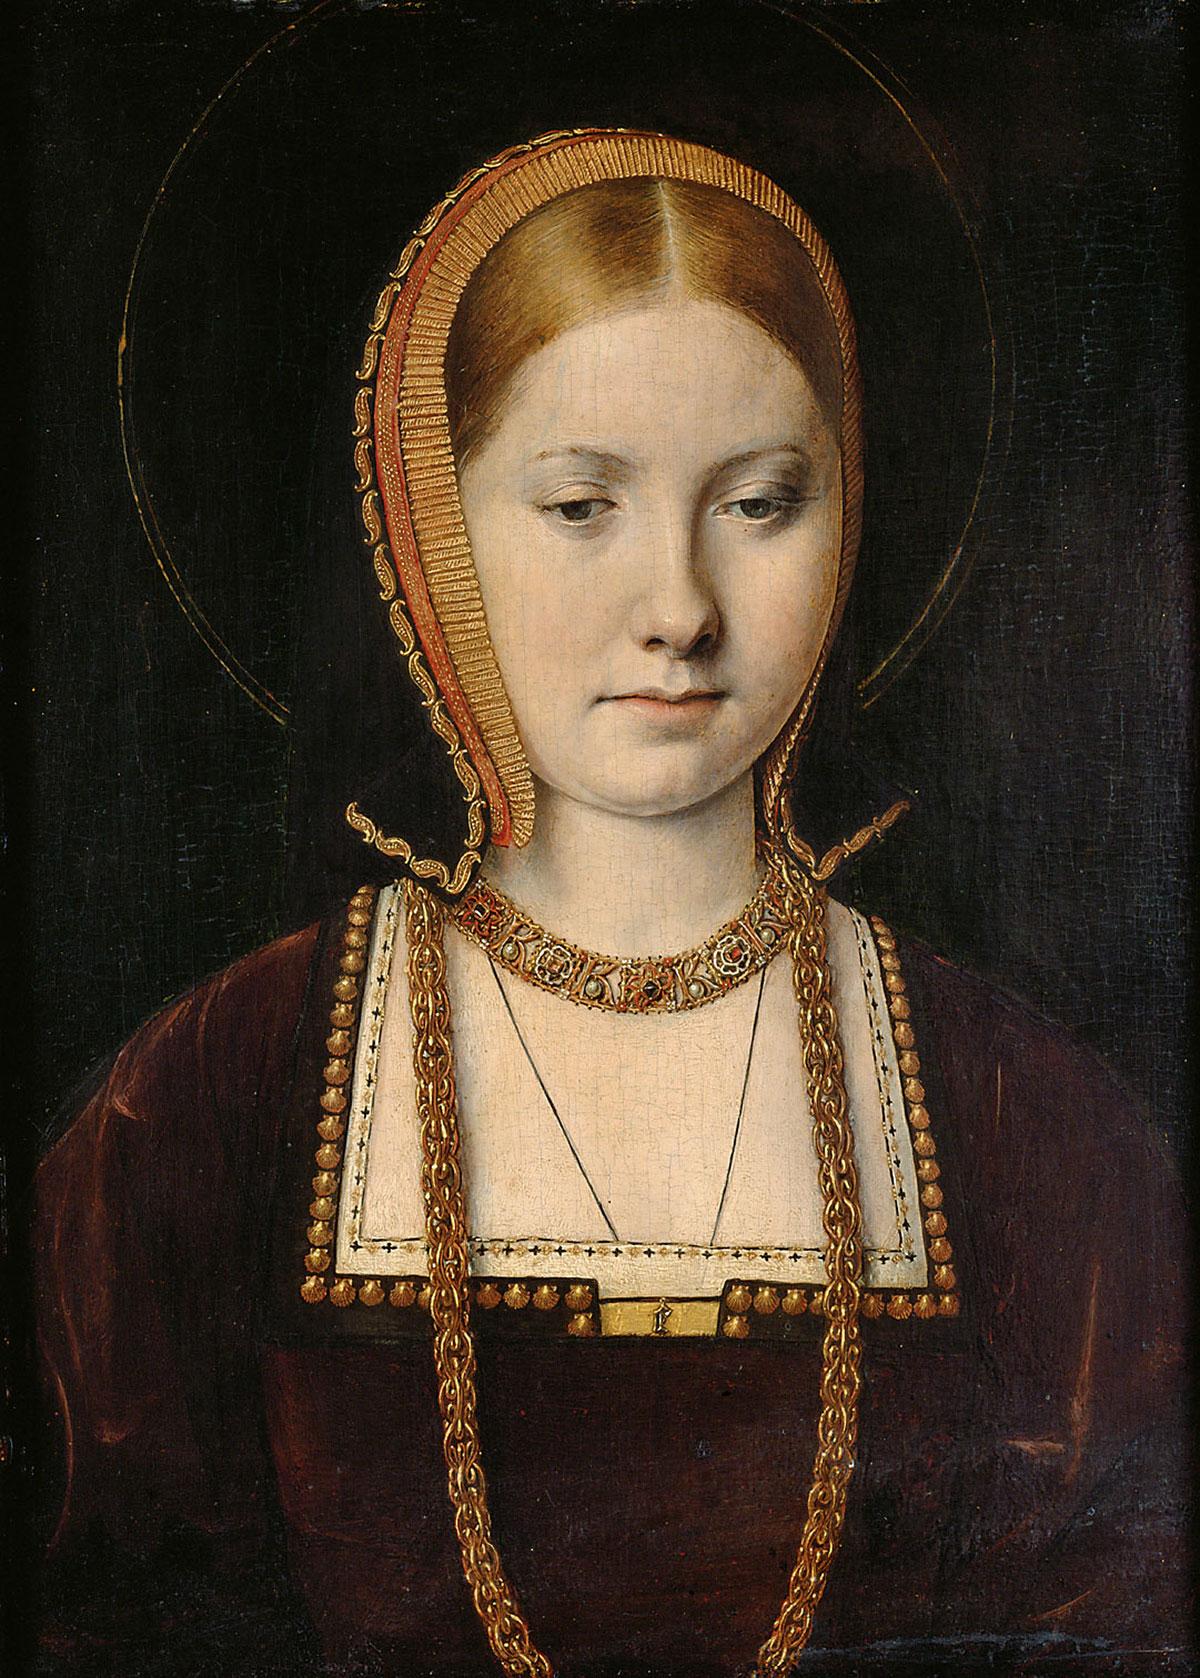 Mary Rose Tudor + Sittow, Michael *magnifico